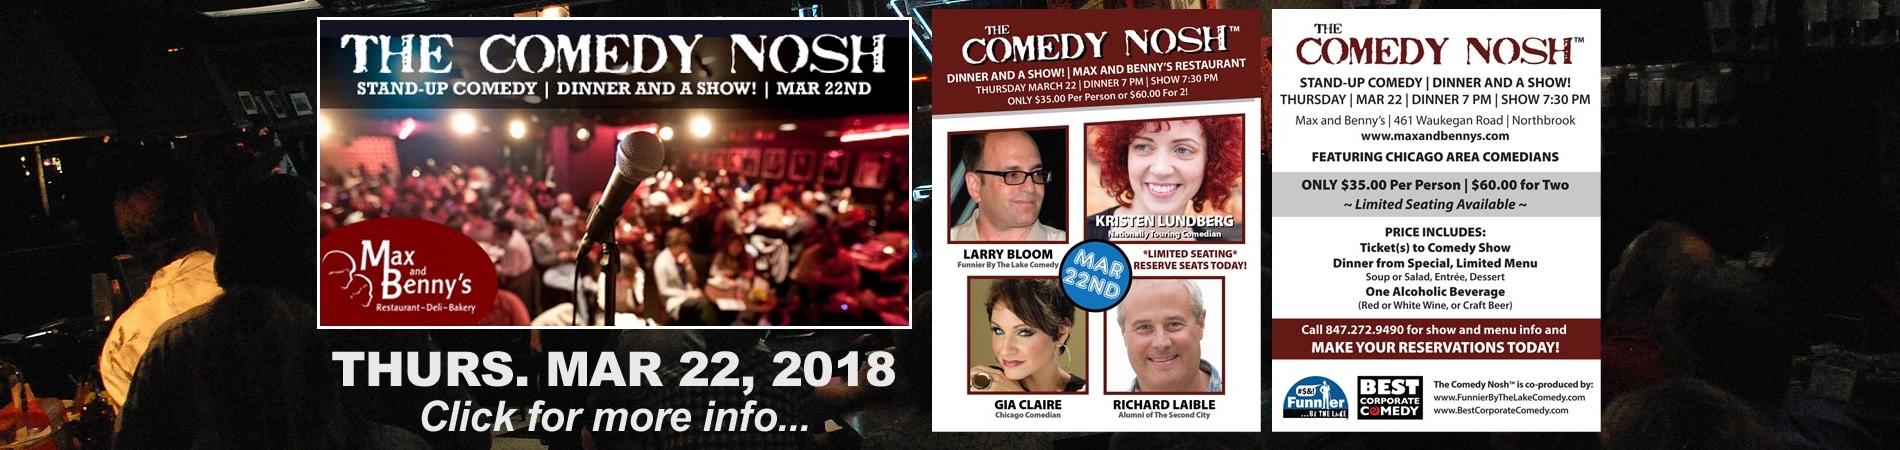 slider-comedynosh-03-2018